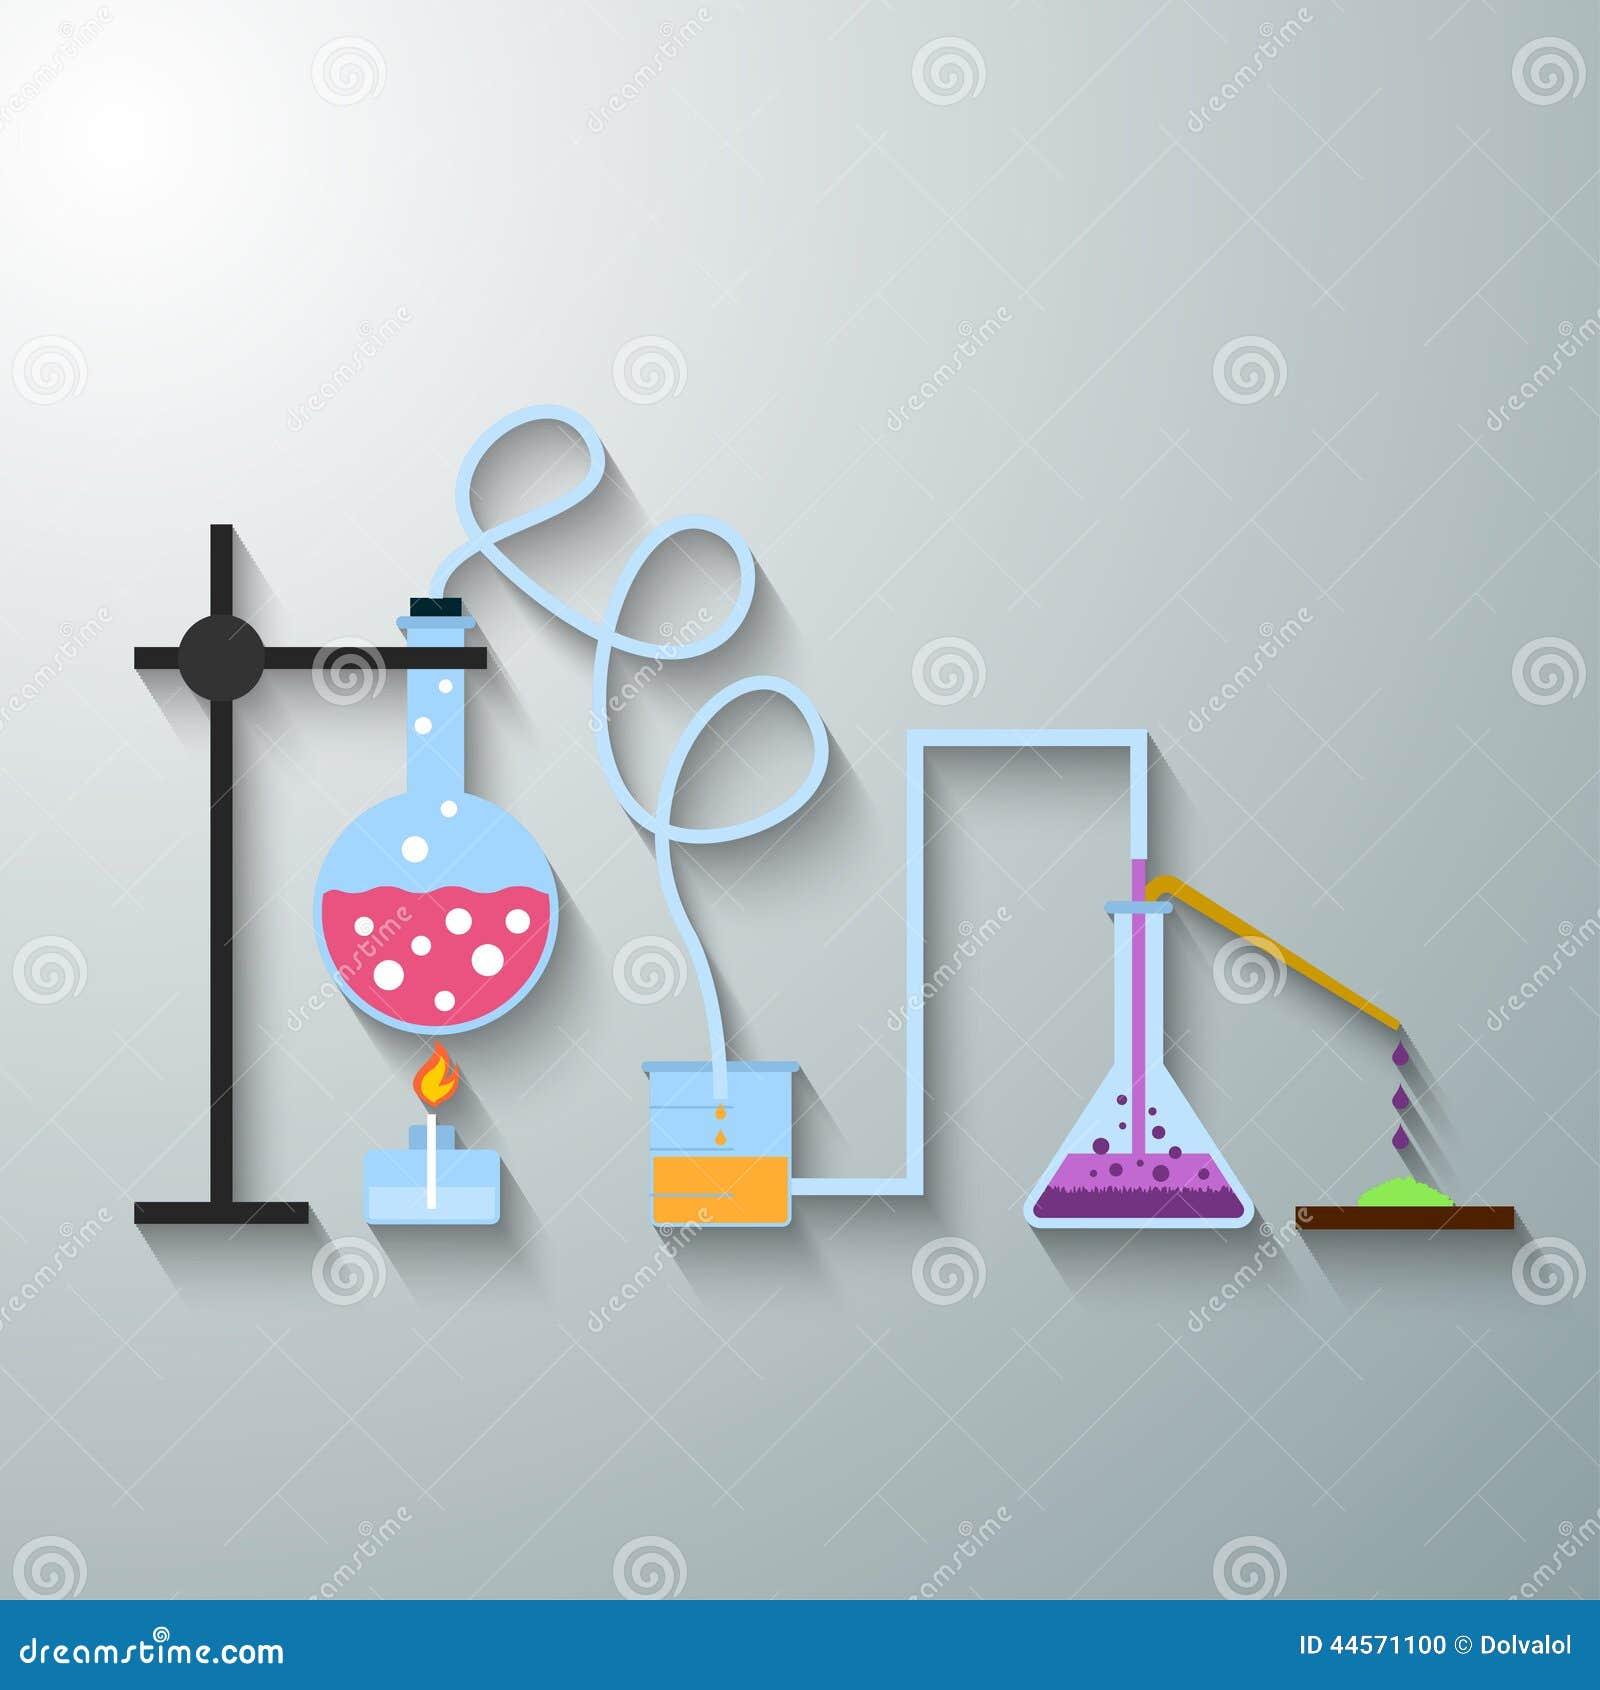 Substancja chemiczna infographic